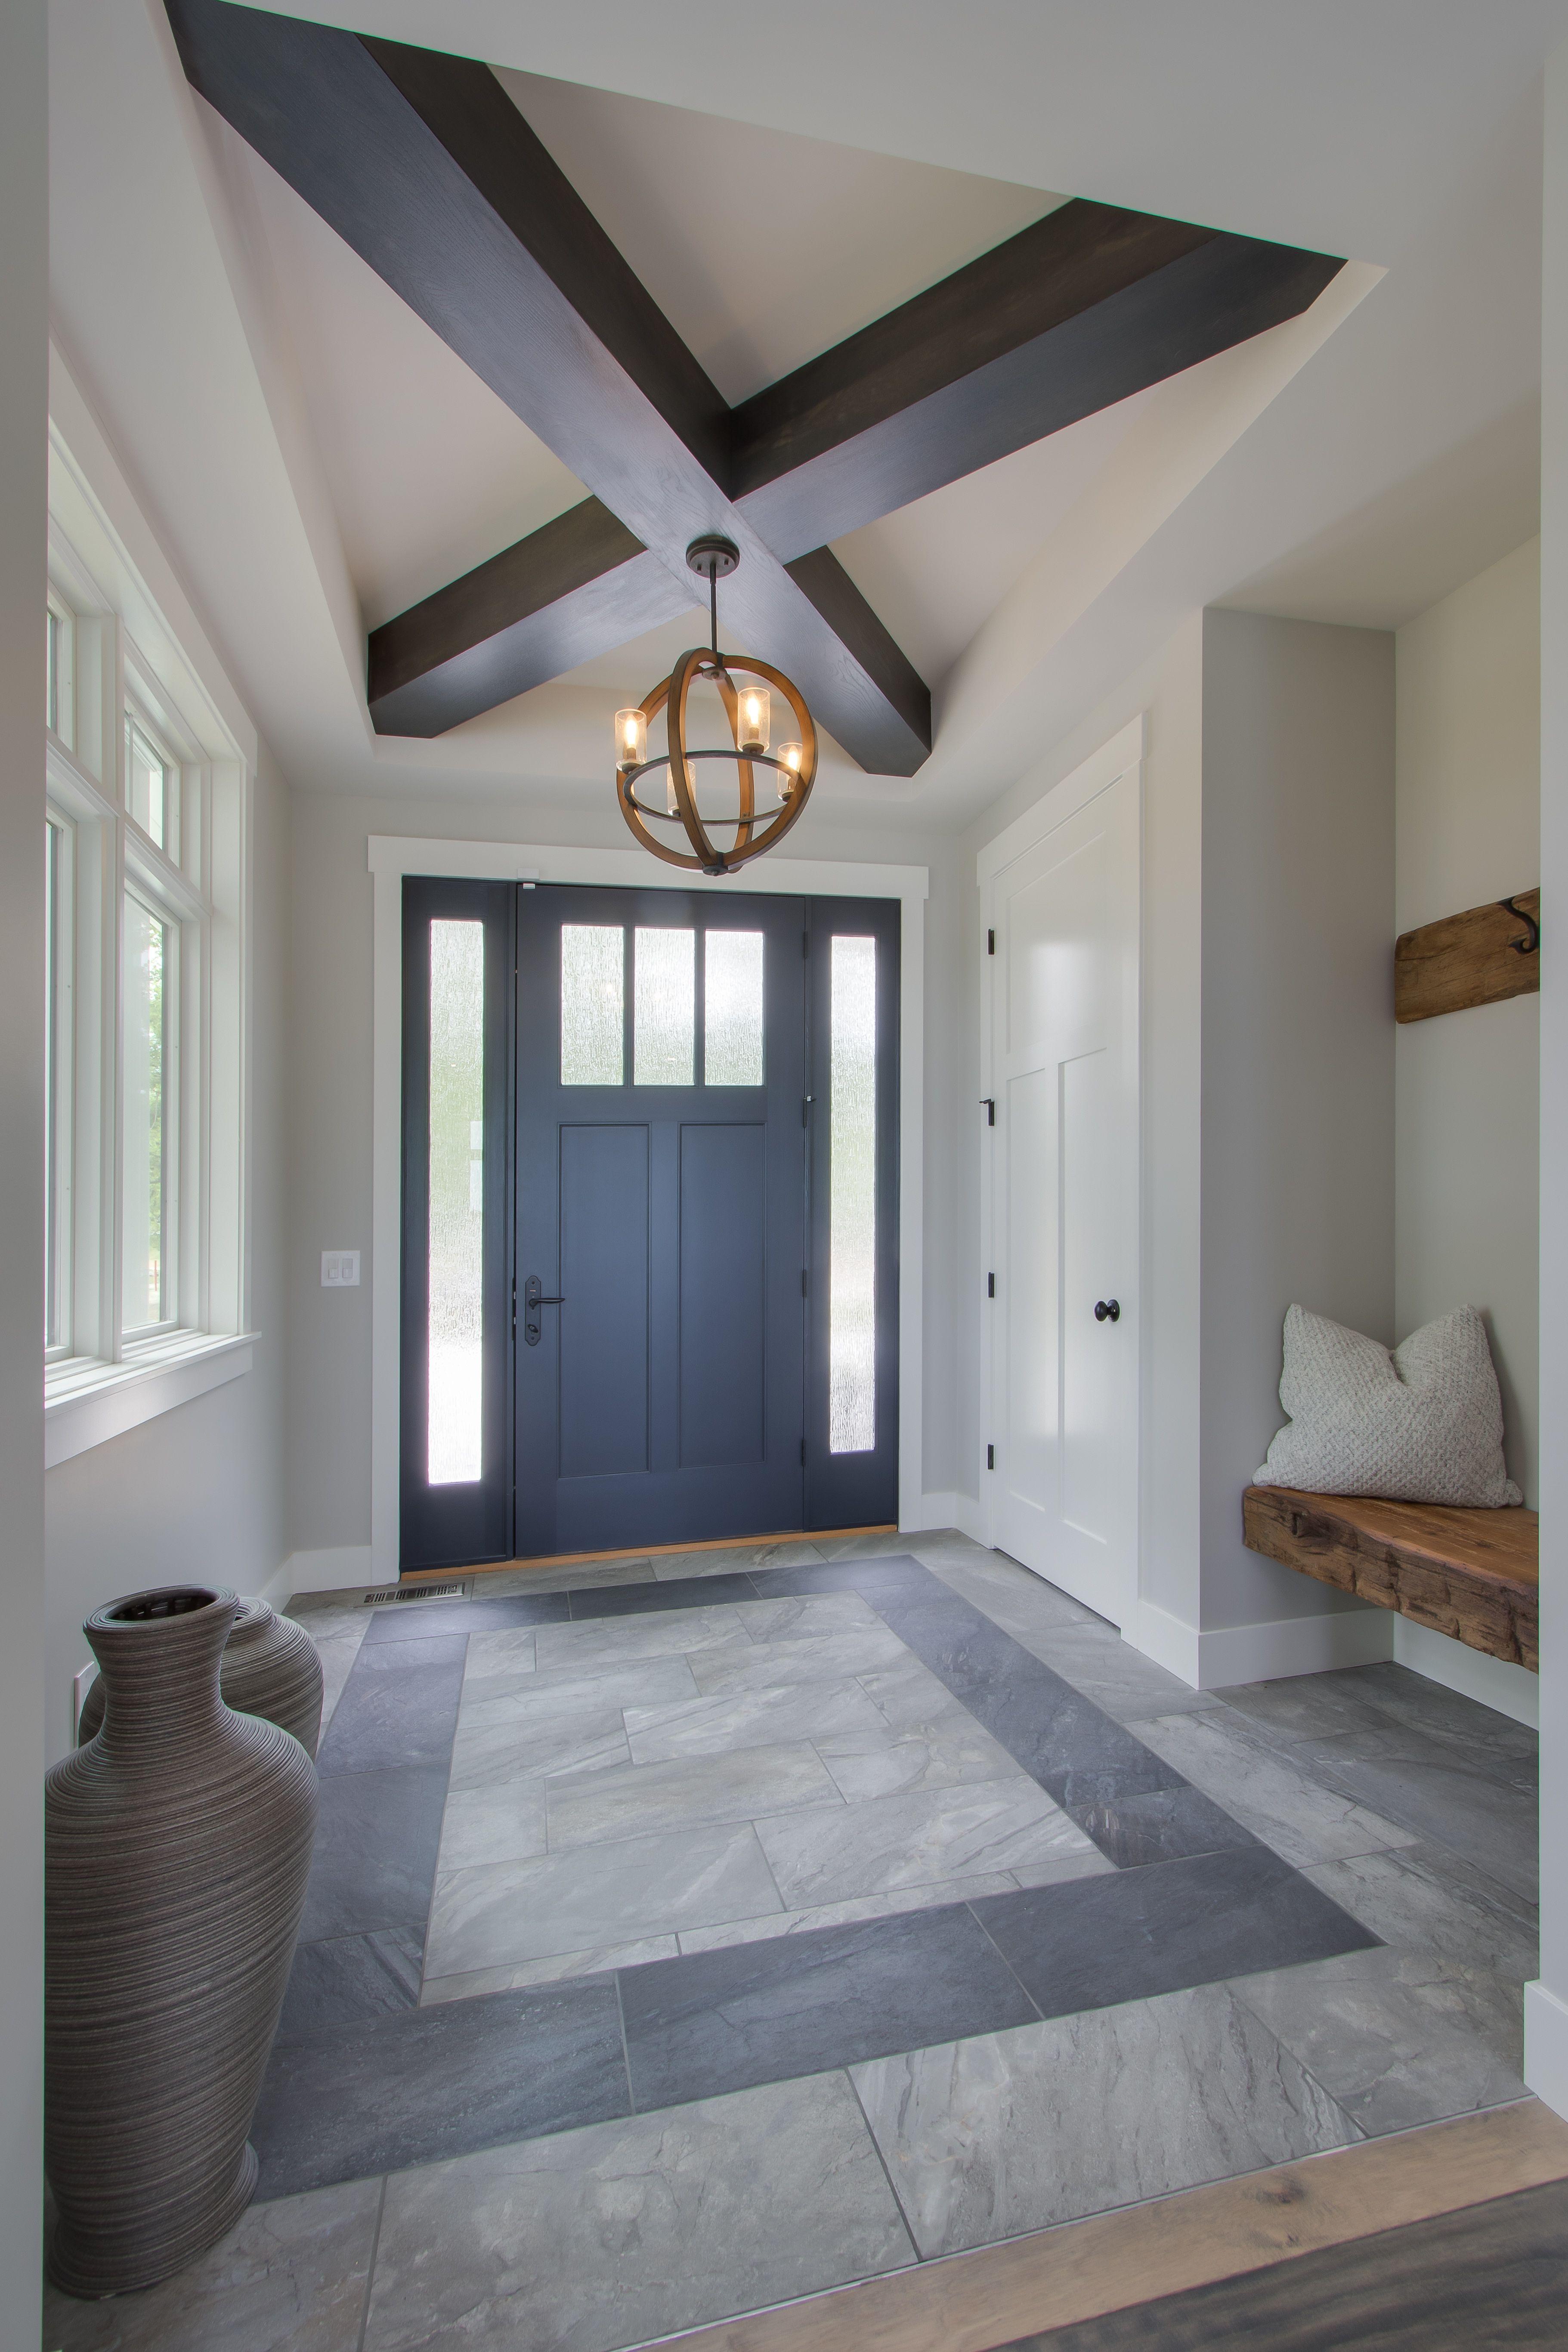 Entry Ceramic Tile Floor Contrasting Color Detail Coffer Ceiling Box